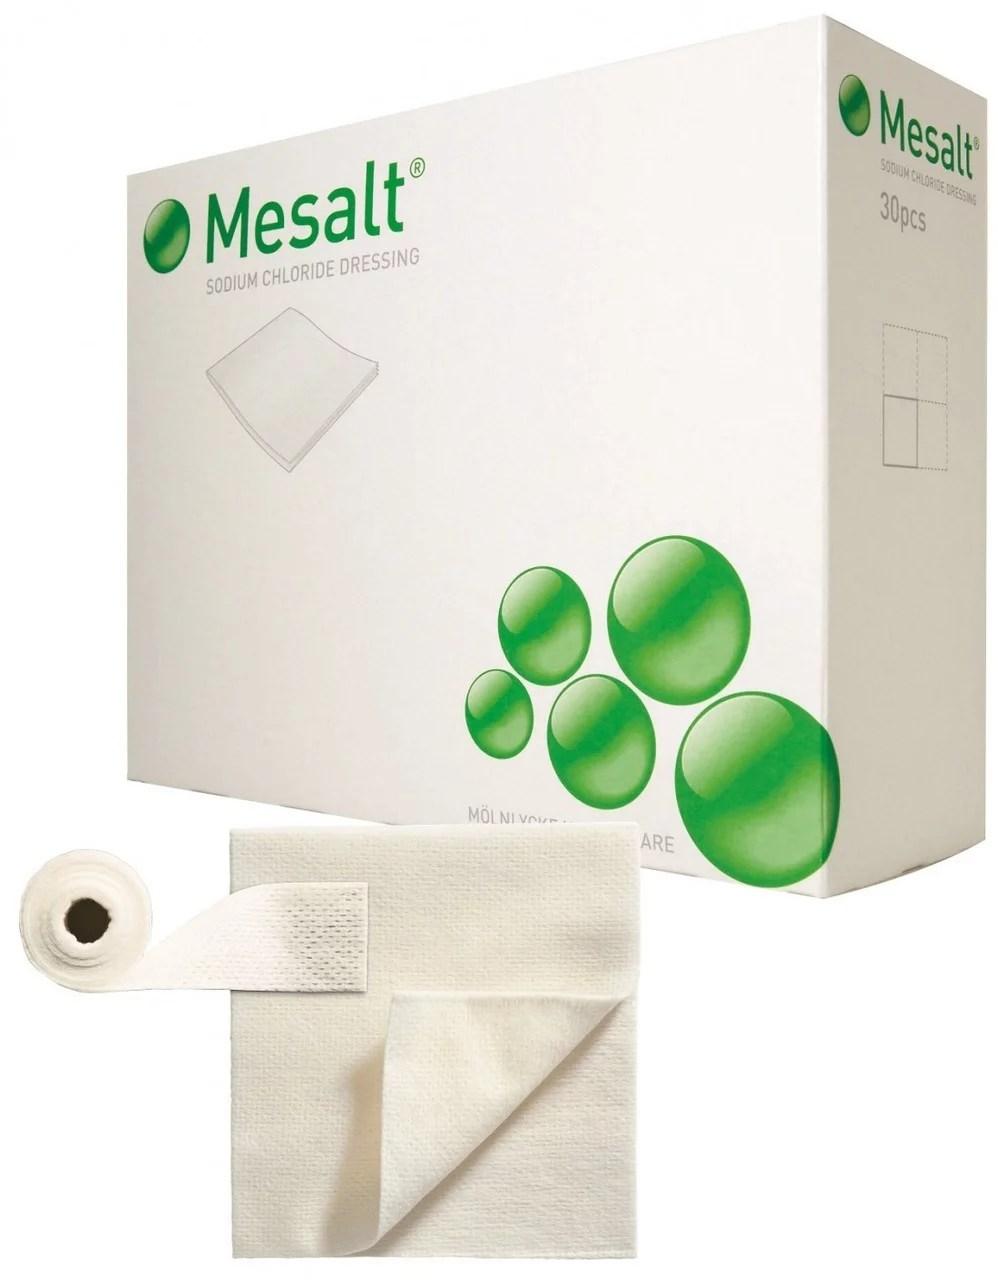 Mesalt Cleansing Sodium Chloride Dressing. 4 x 4 Inch - Box of 30 - Walmart.com